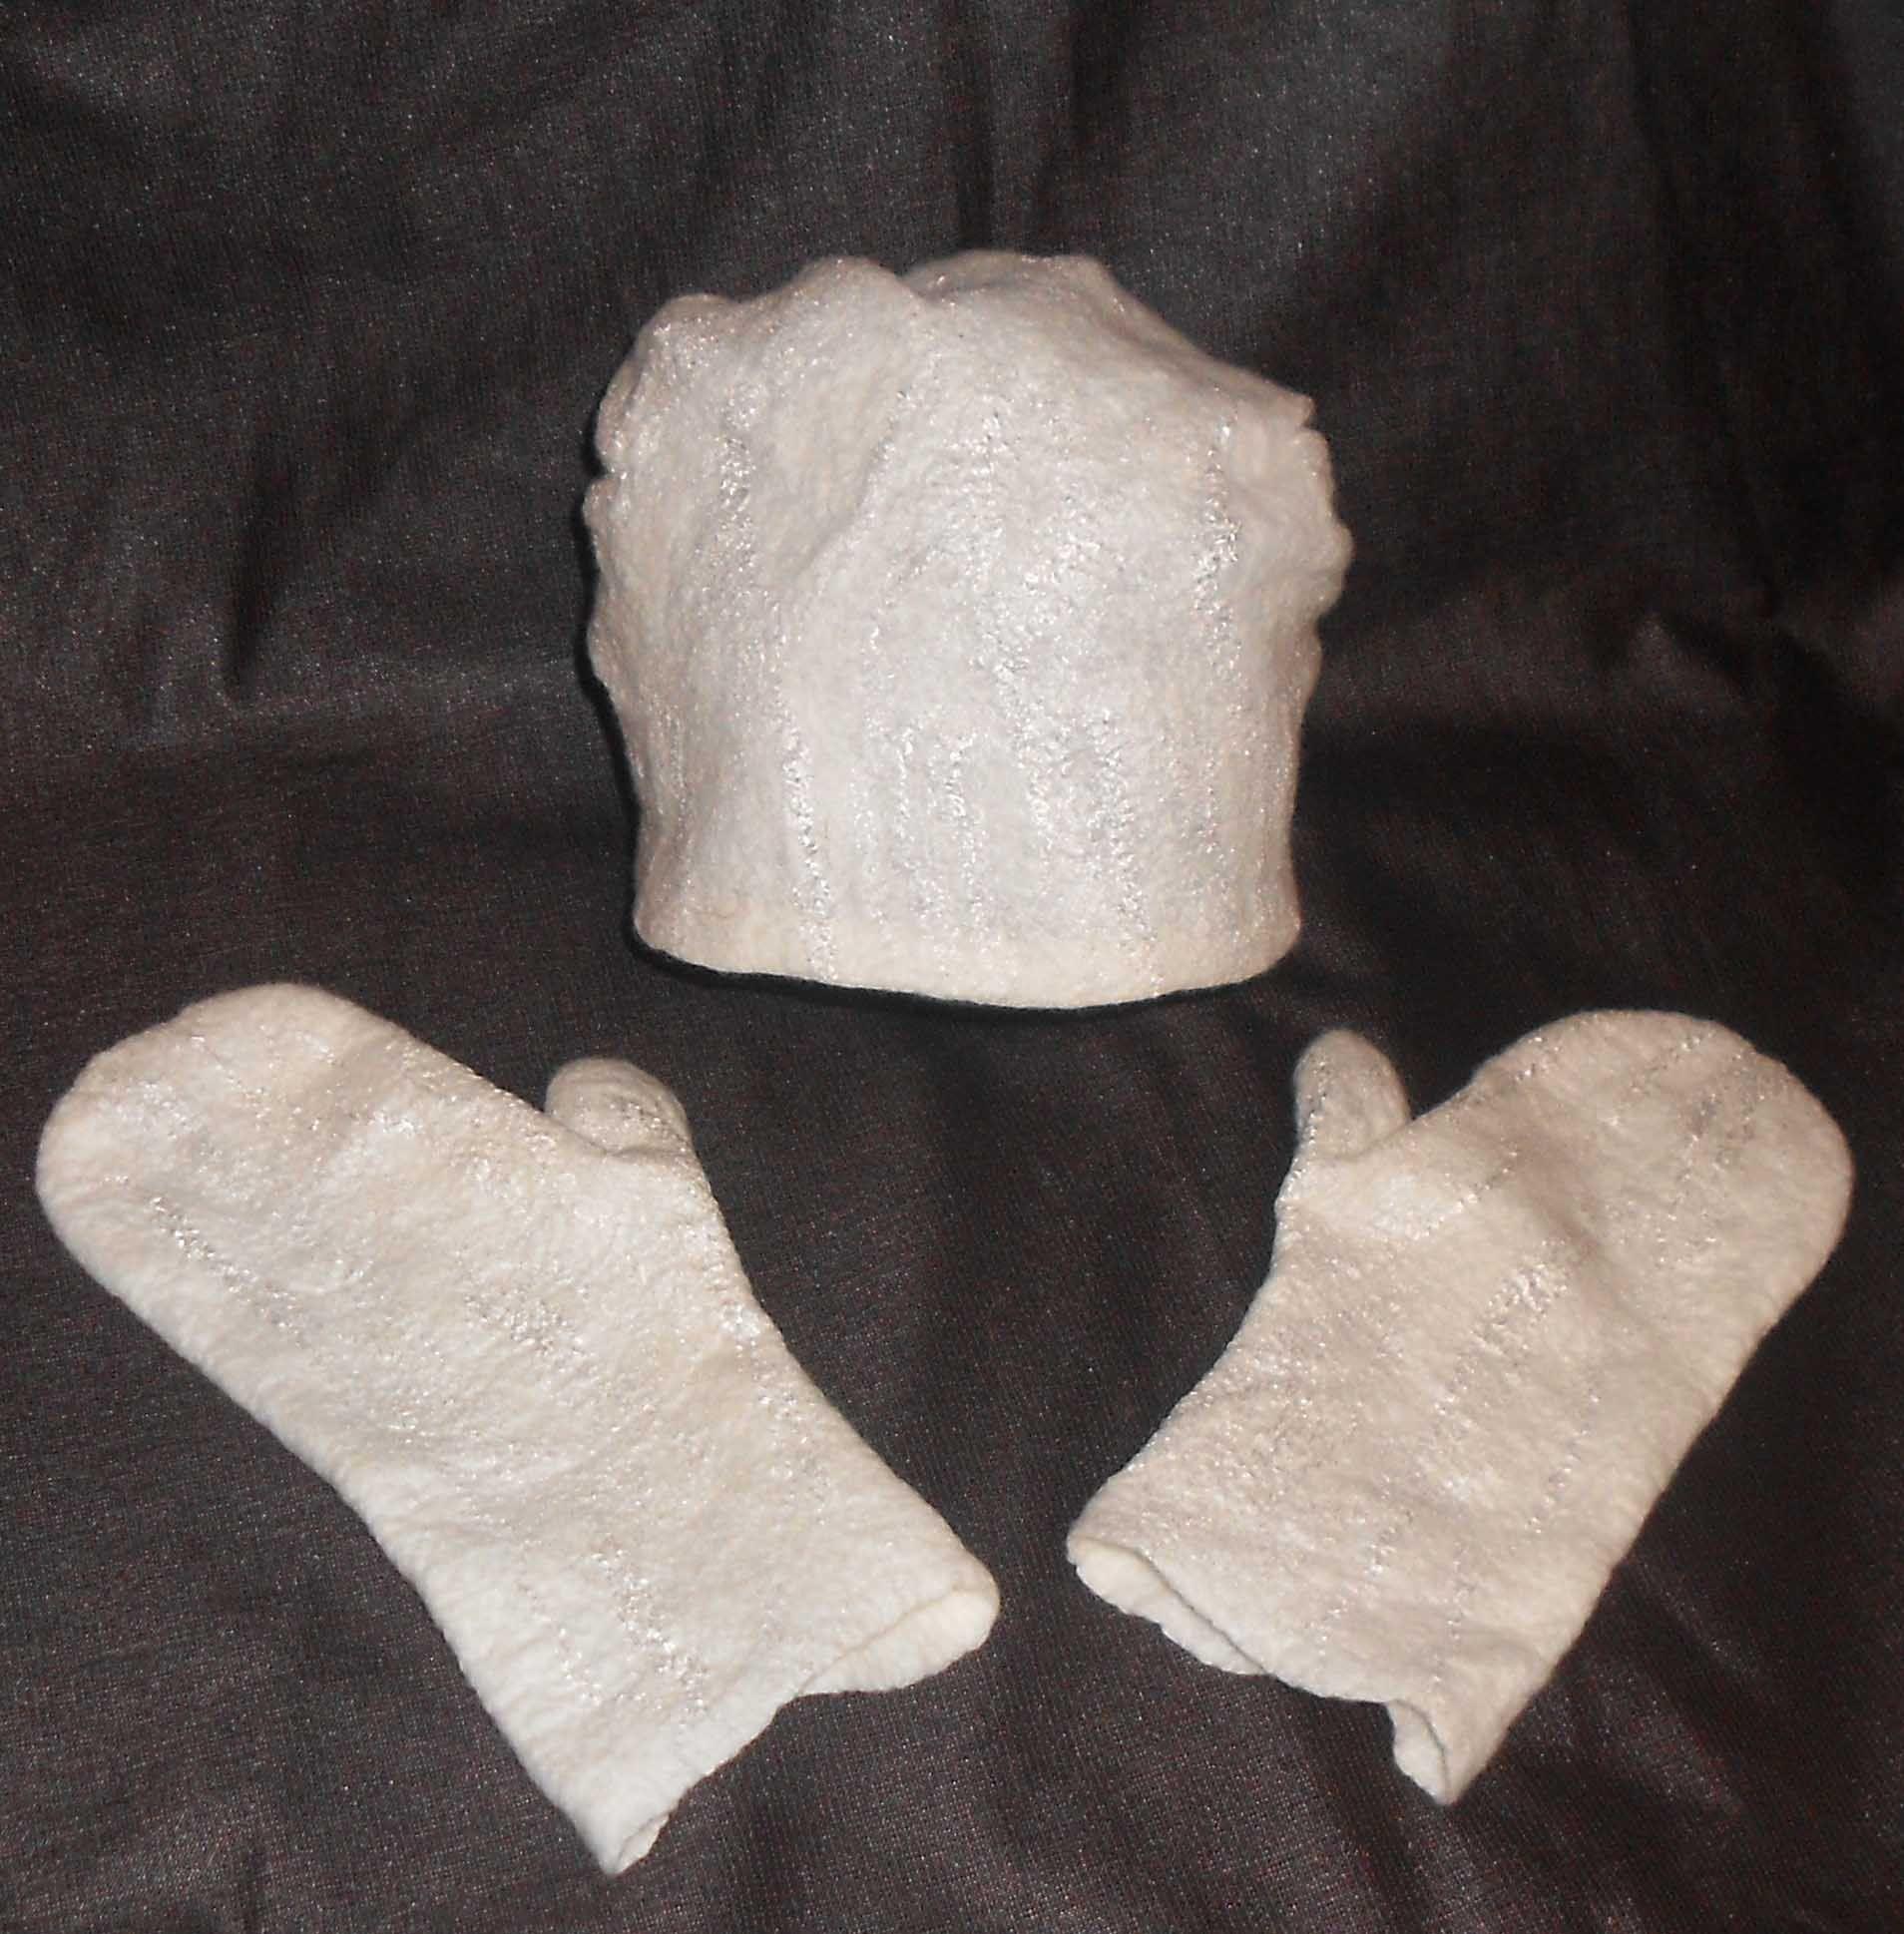 handmade комплект белый валяные варежки аксессуары шапка шерсть подарок